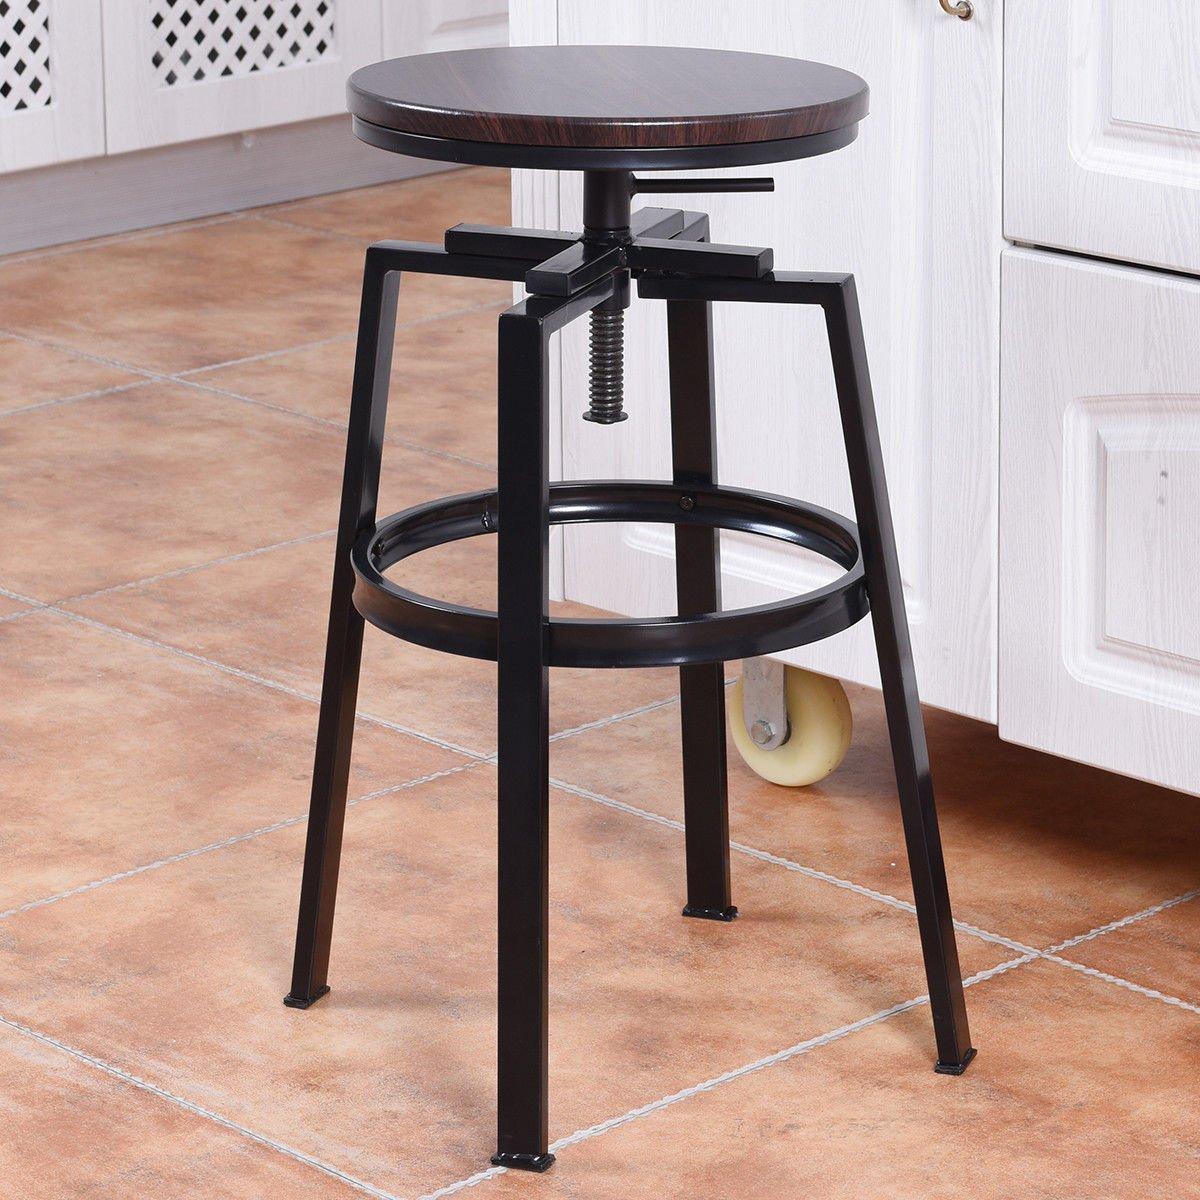 Awe Inspiring Amazon Com Wooden Black Iron Vintage Table Industrial Beatyapartments Chair Design Images Beatyapartmentscom